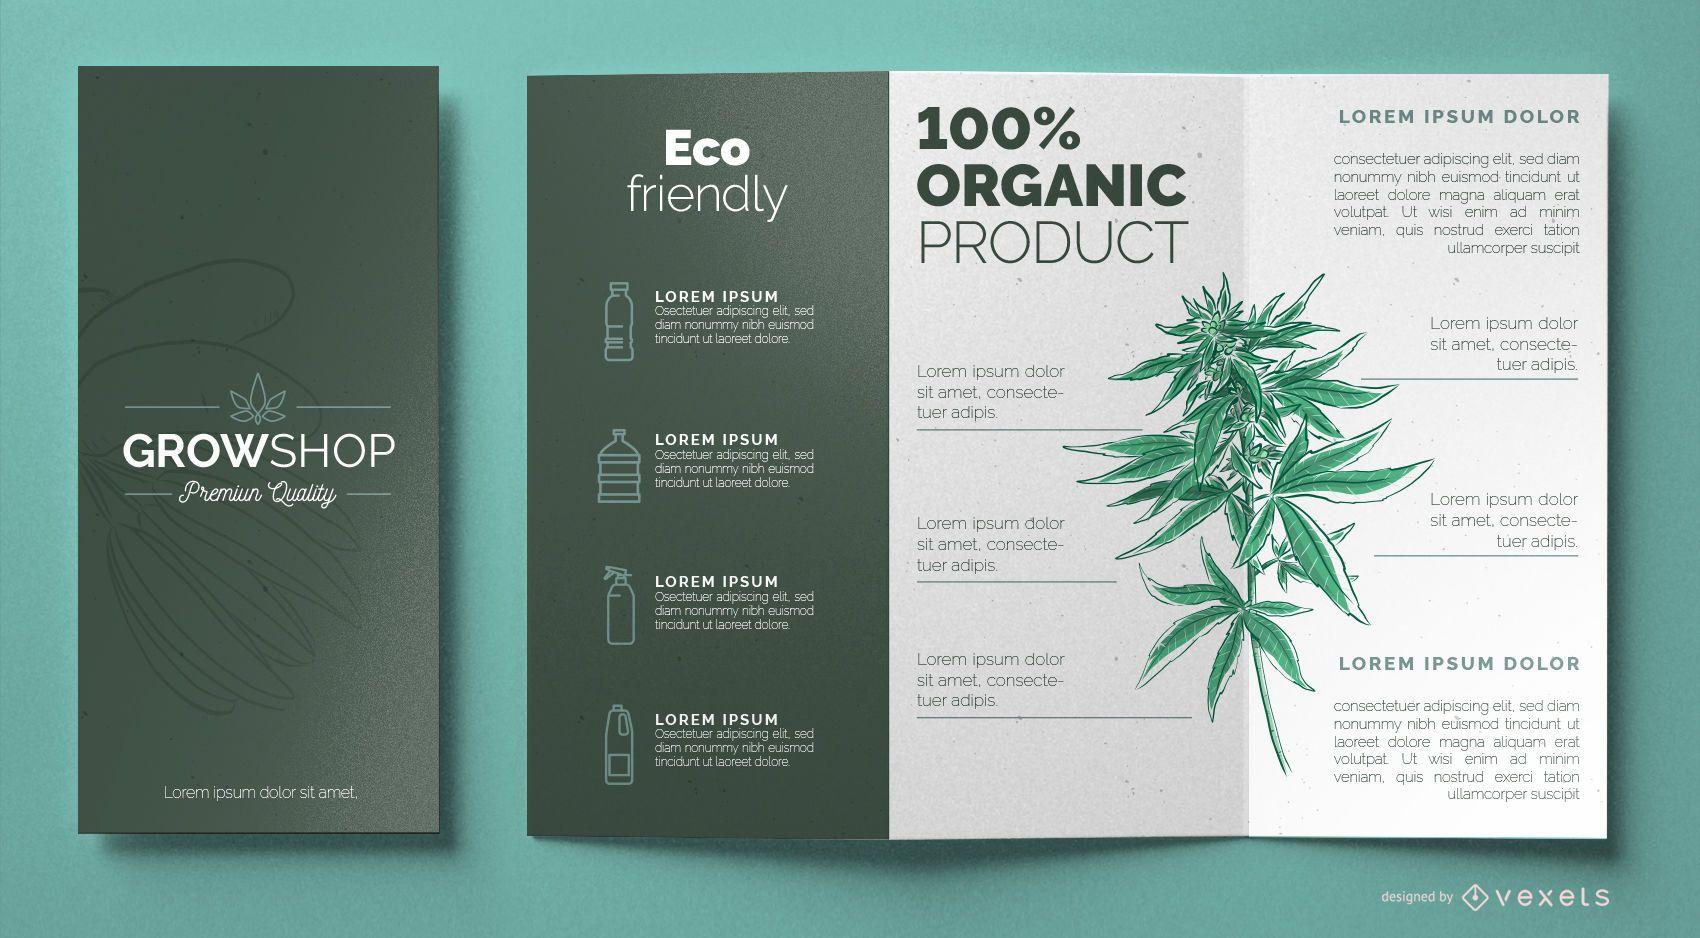 Grow shop brochure template